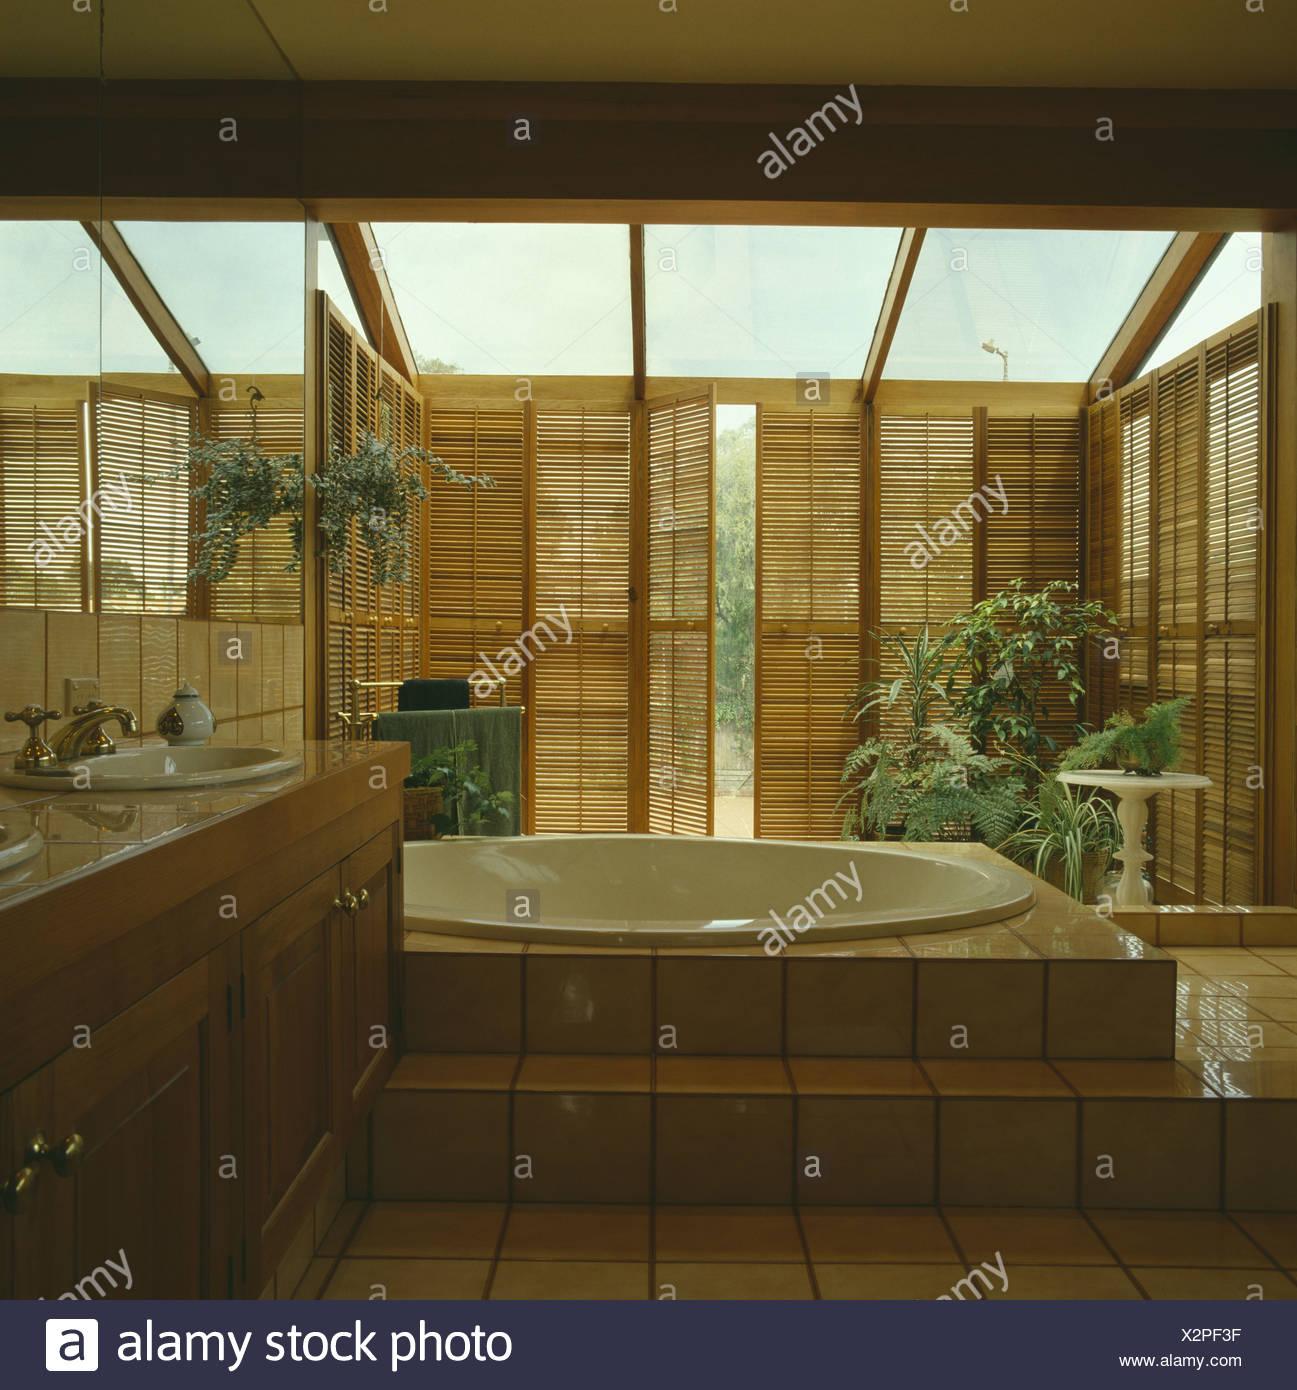 Raised Circular Bath In Modern Bathroom Extension With